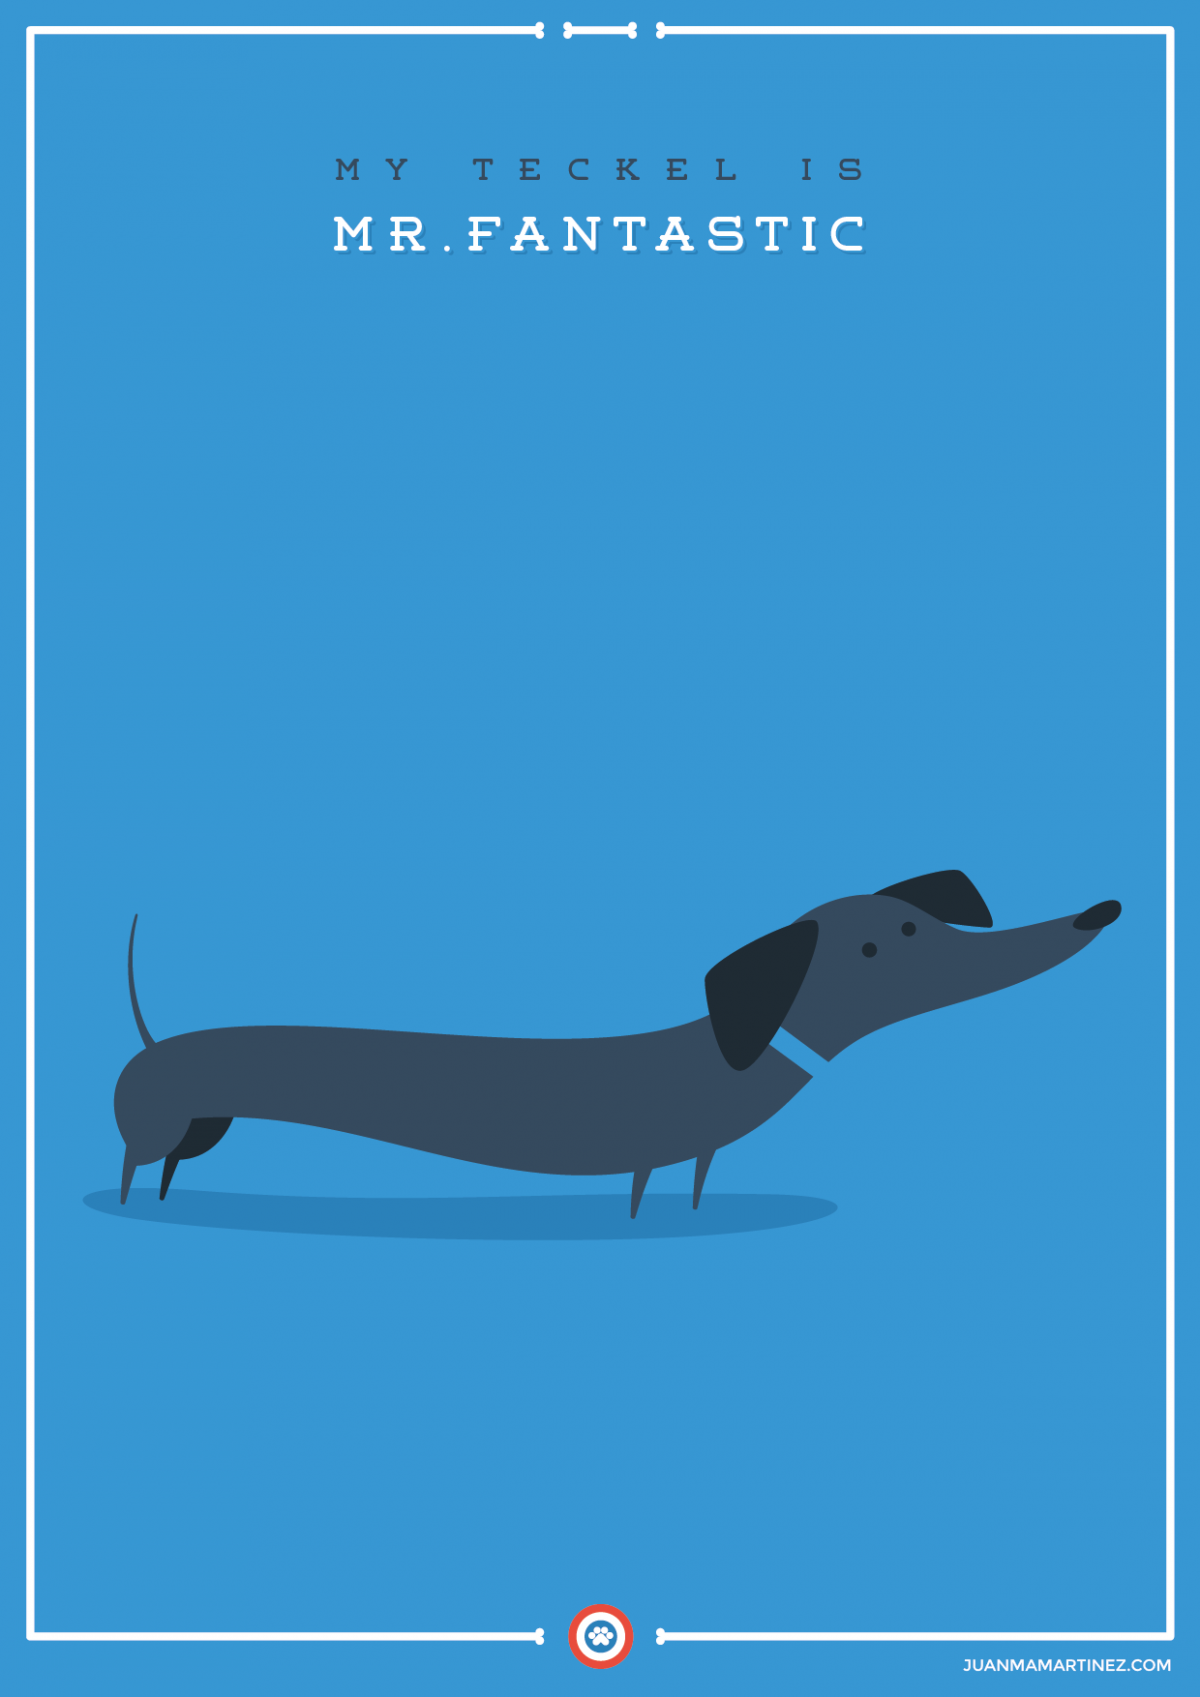 extraordinary-doggies-illustration-6